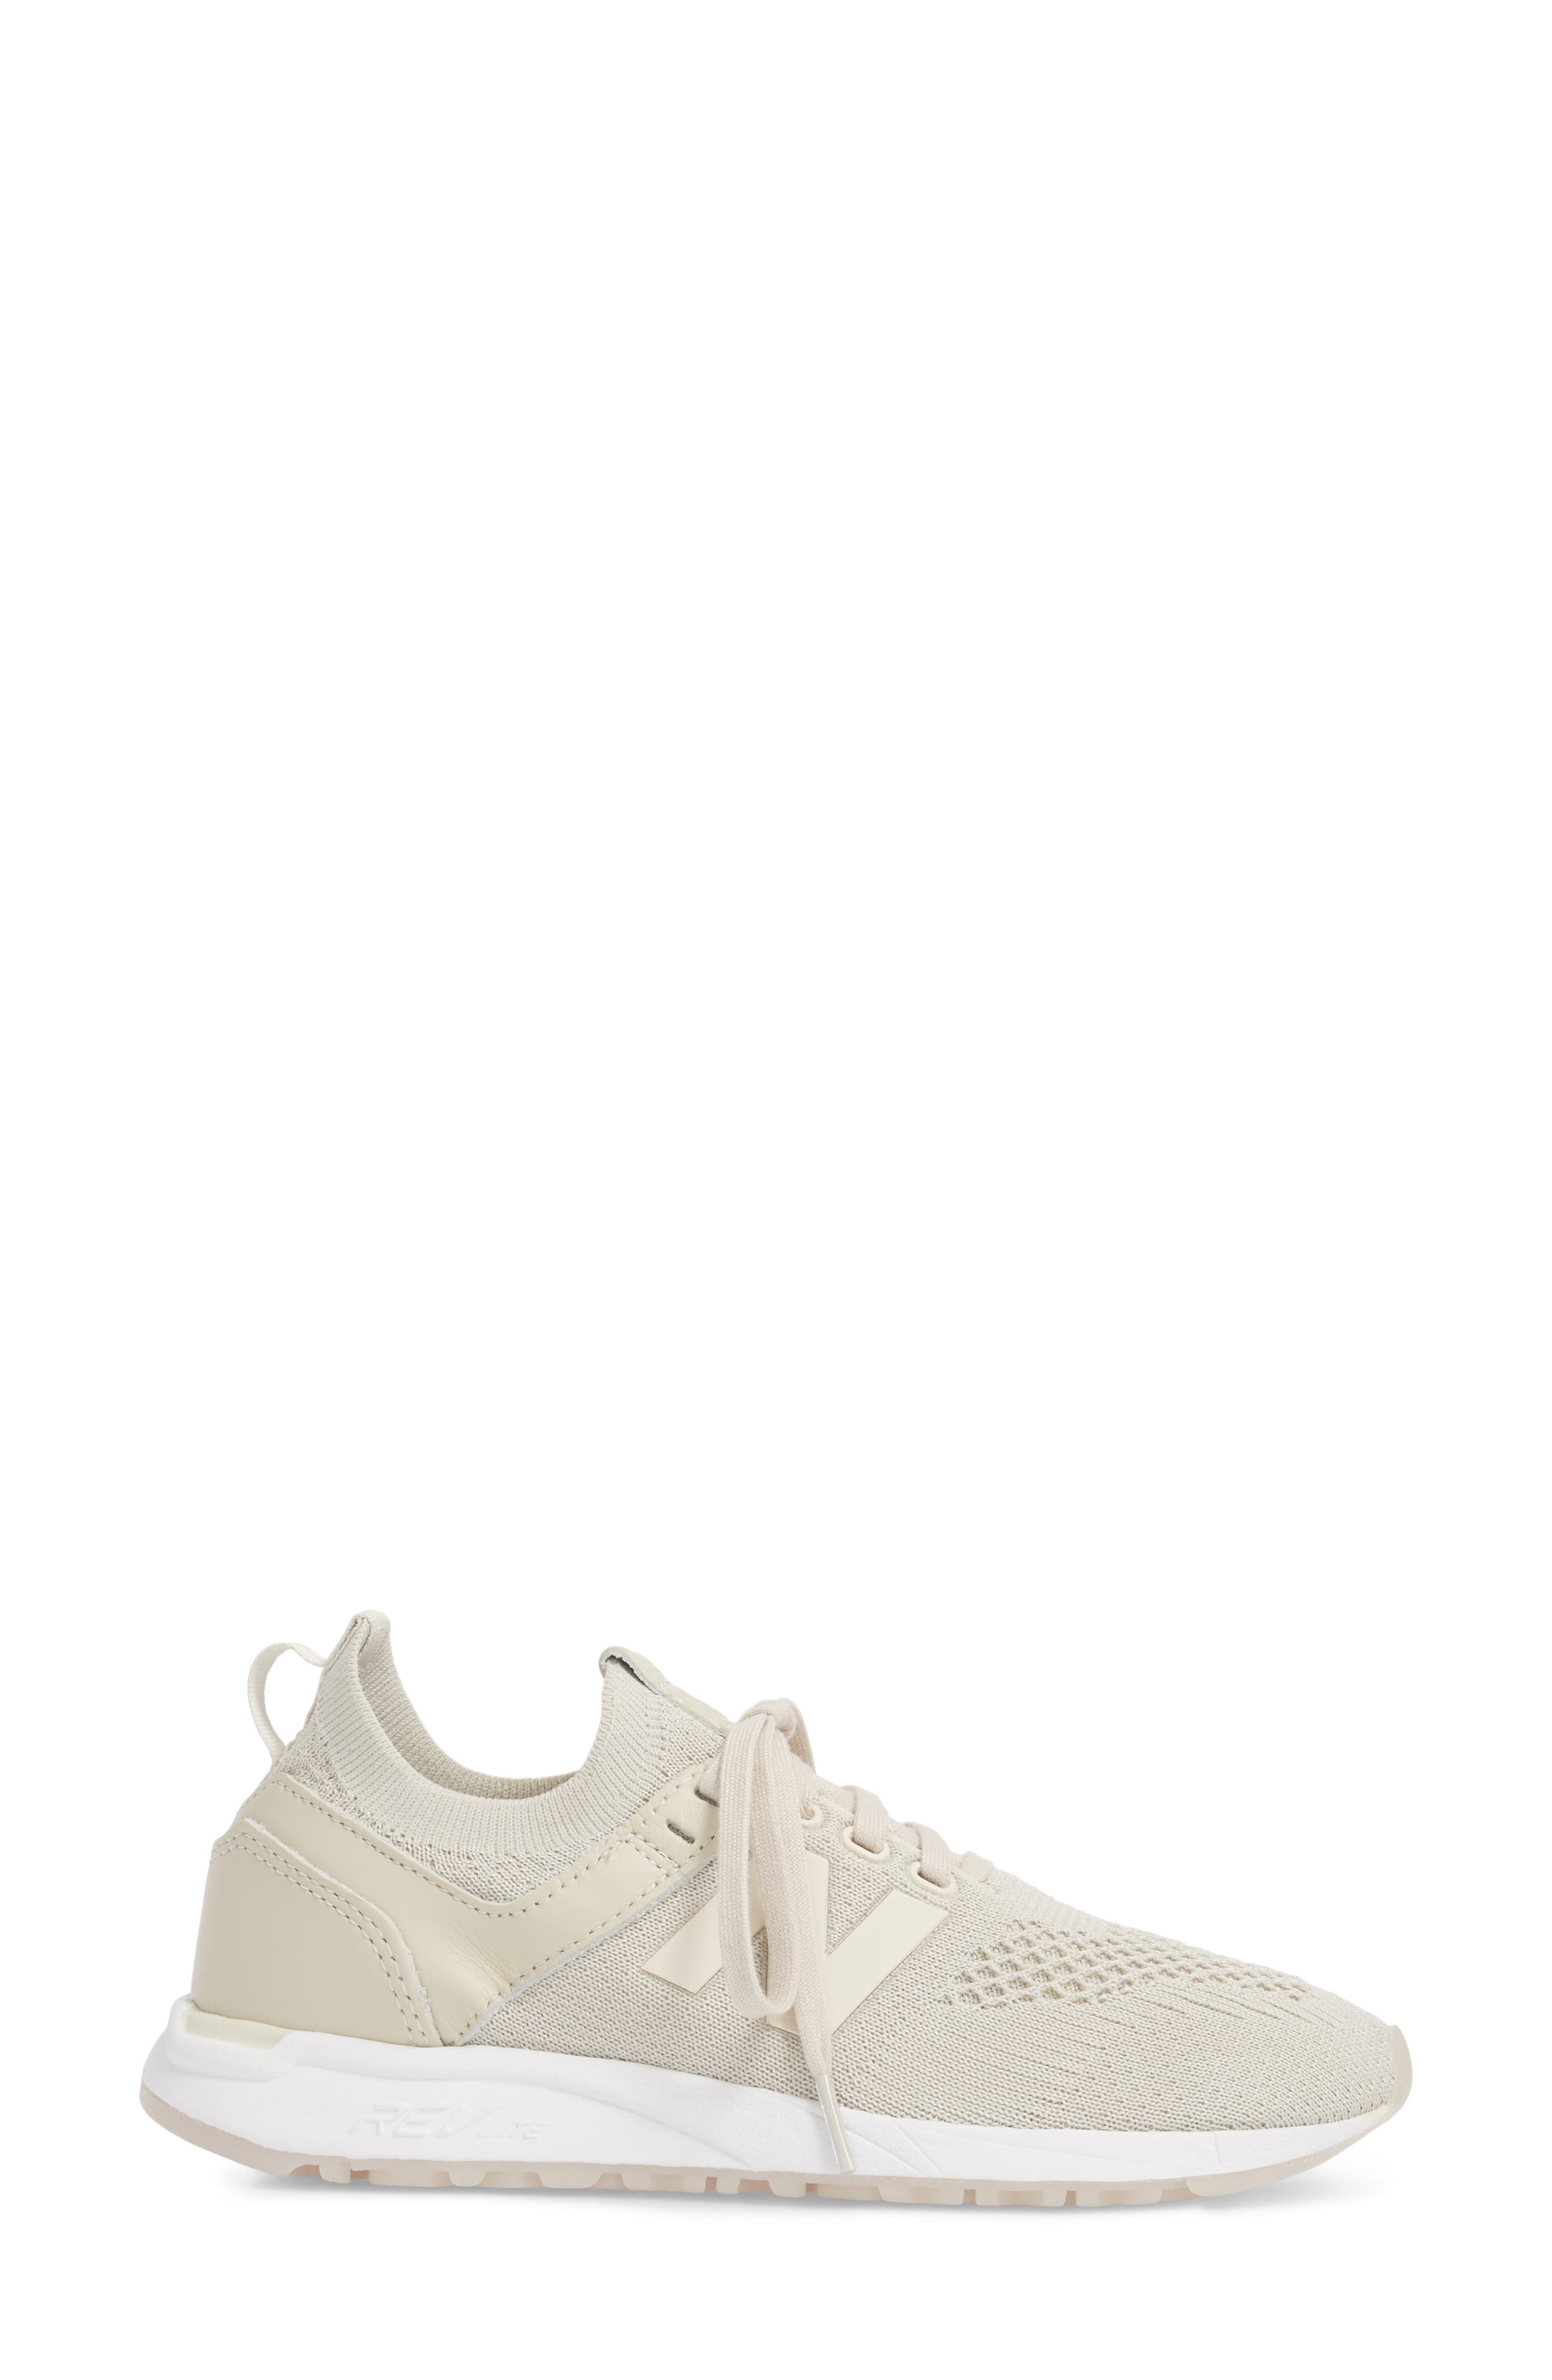 247 Decon Knit Sneaker,                             Alternate thumbnail 3, color,                             Moonbeam